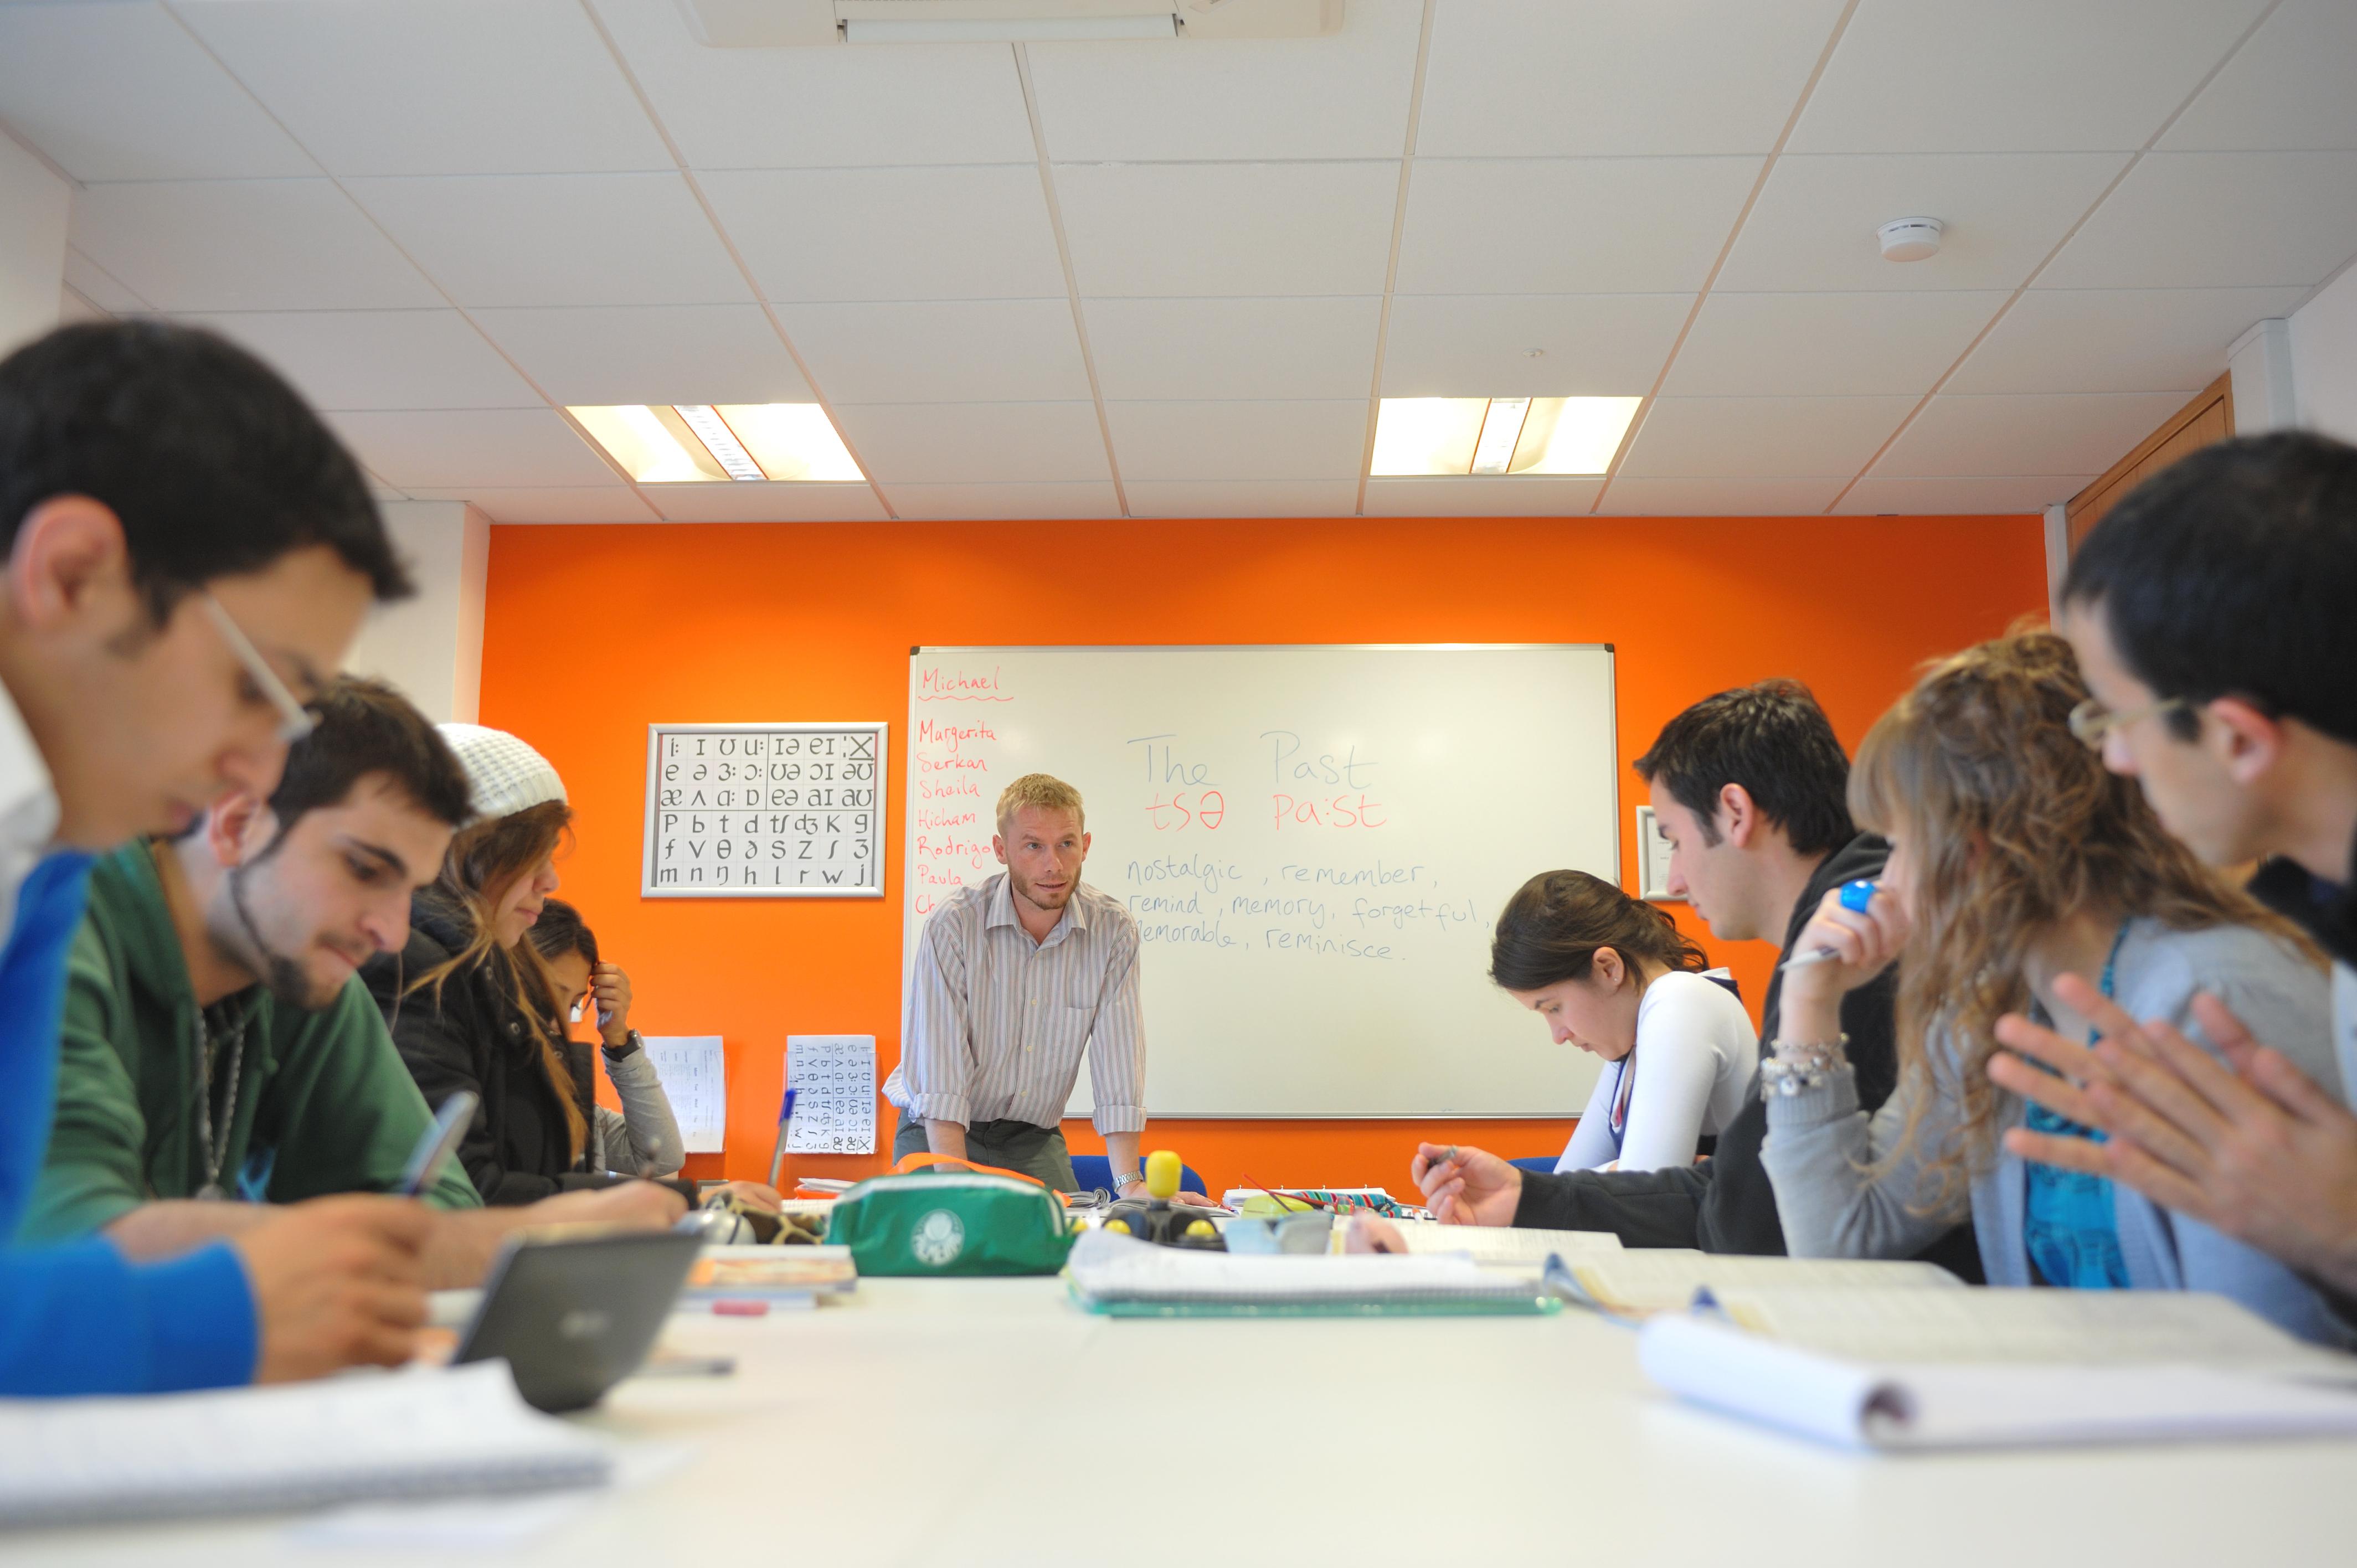 ec_brighton_centre_classroom_5.jpg